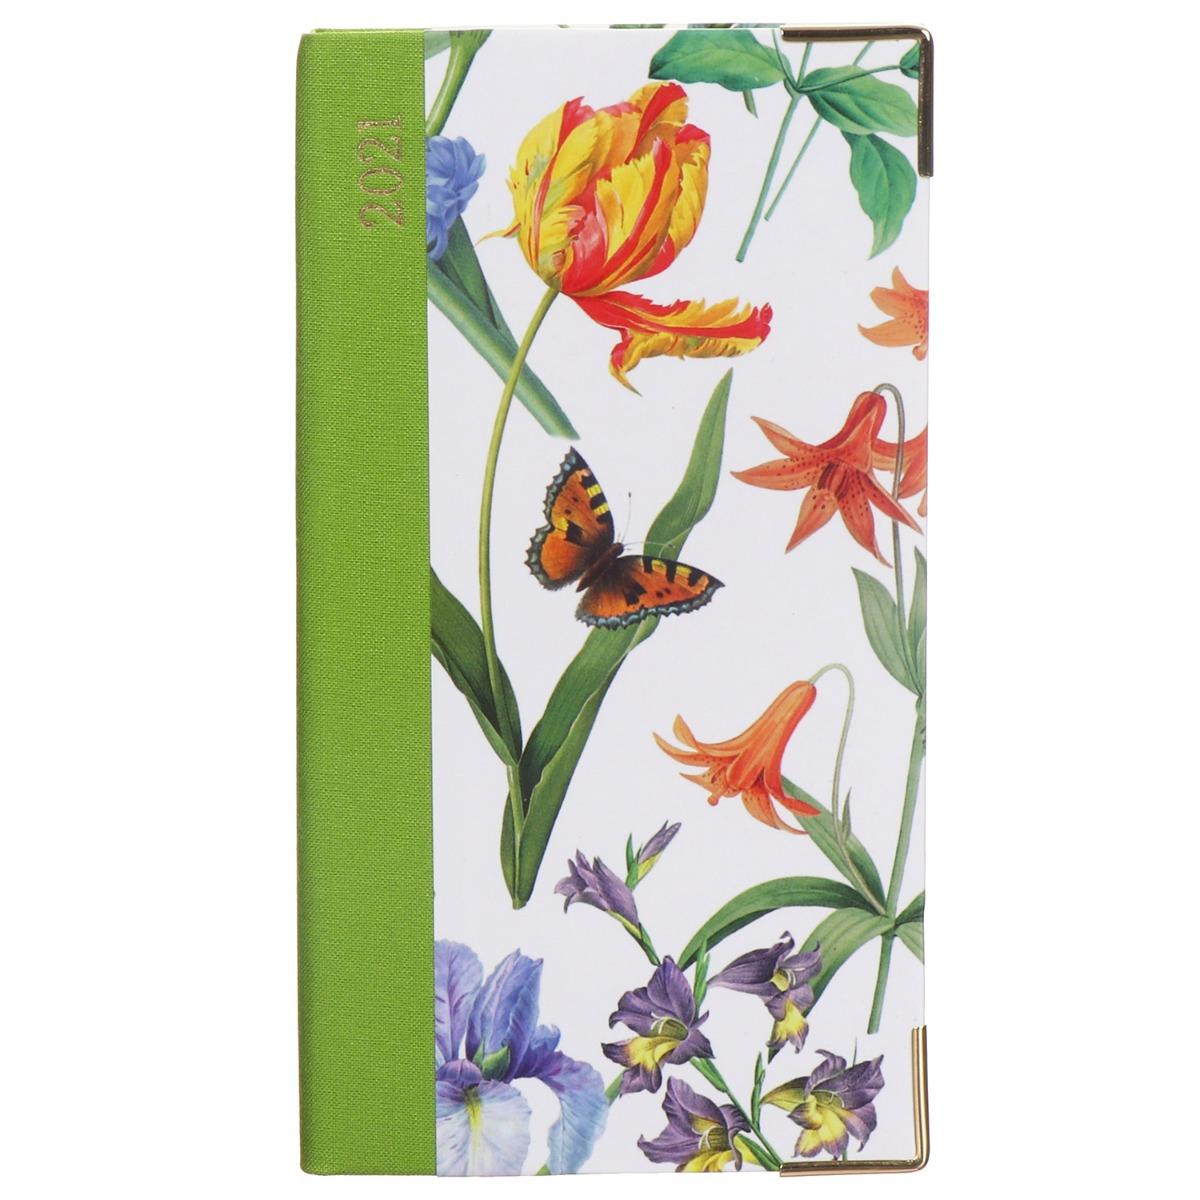 Caspari White Redoute Floral 2021 Slim Diary